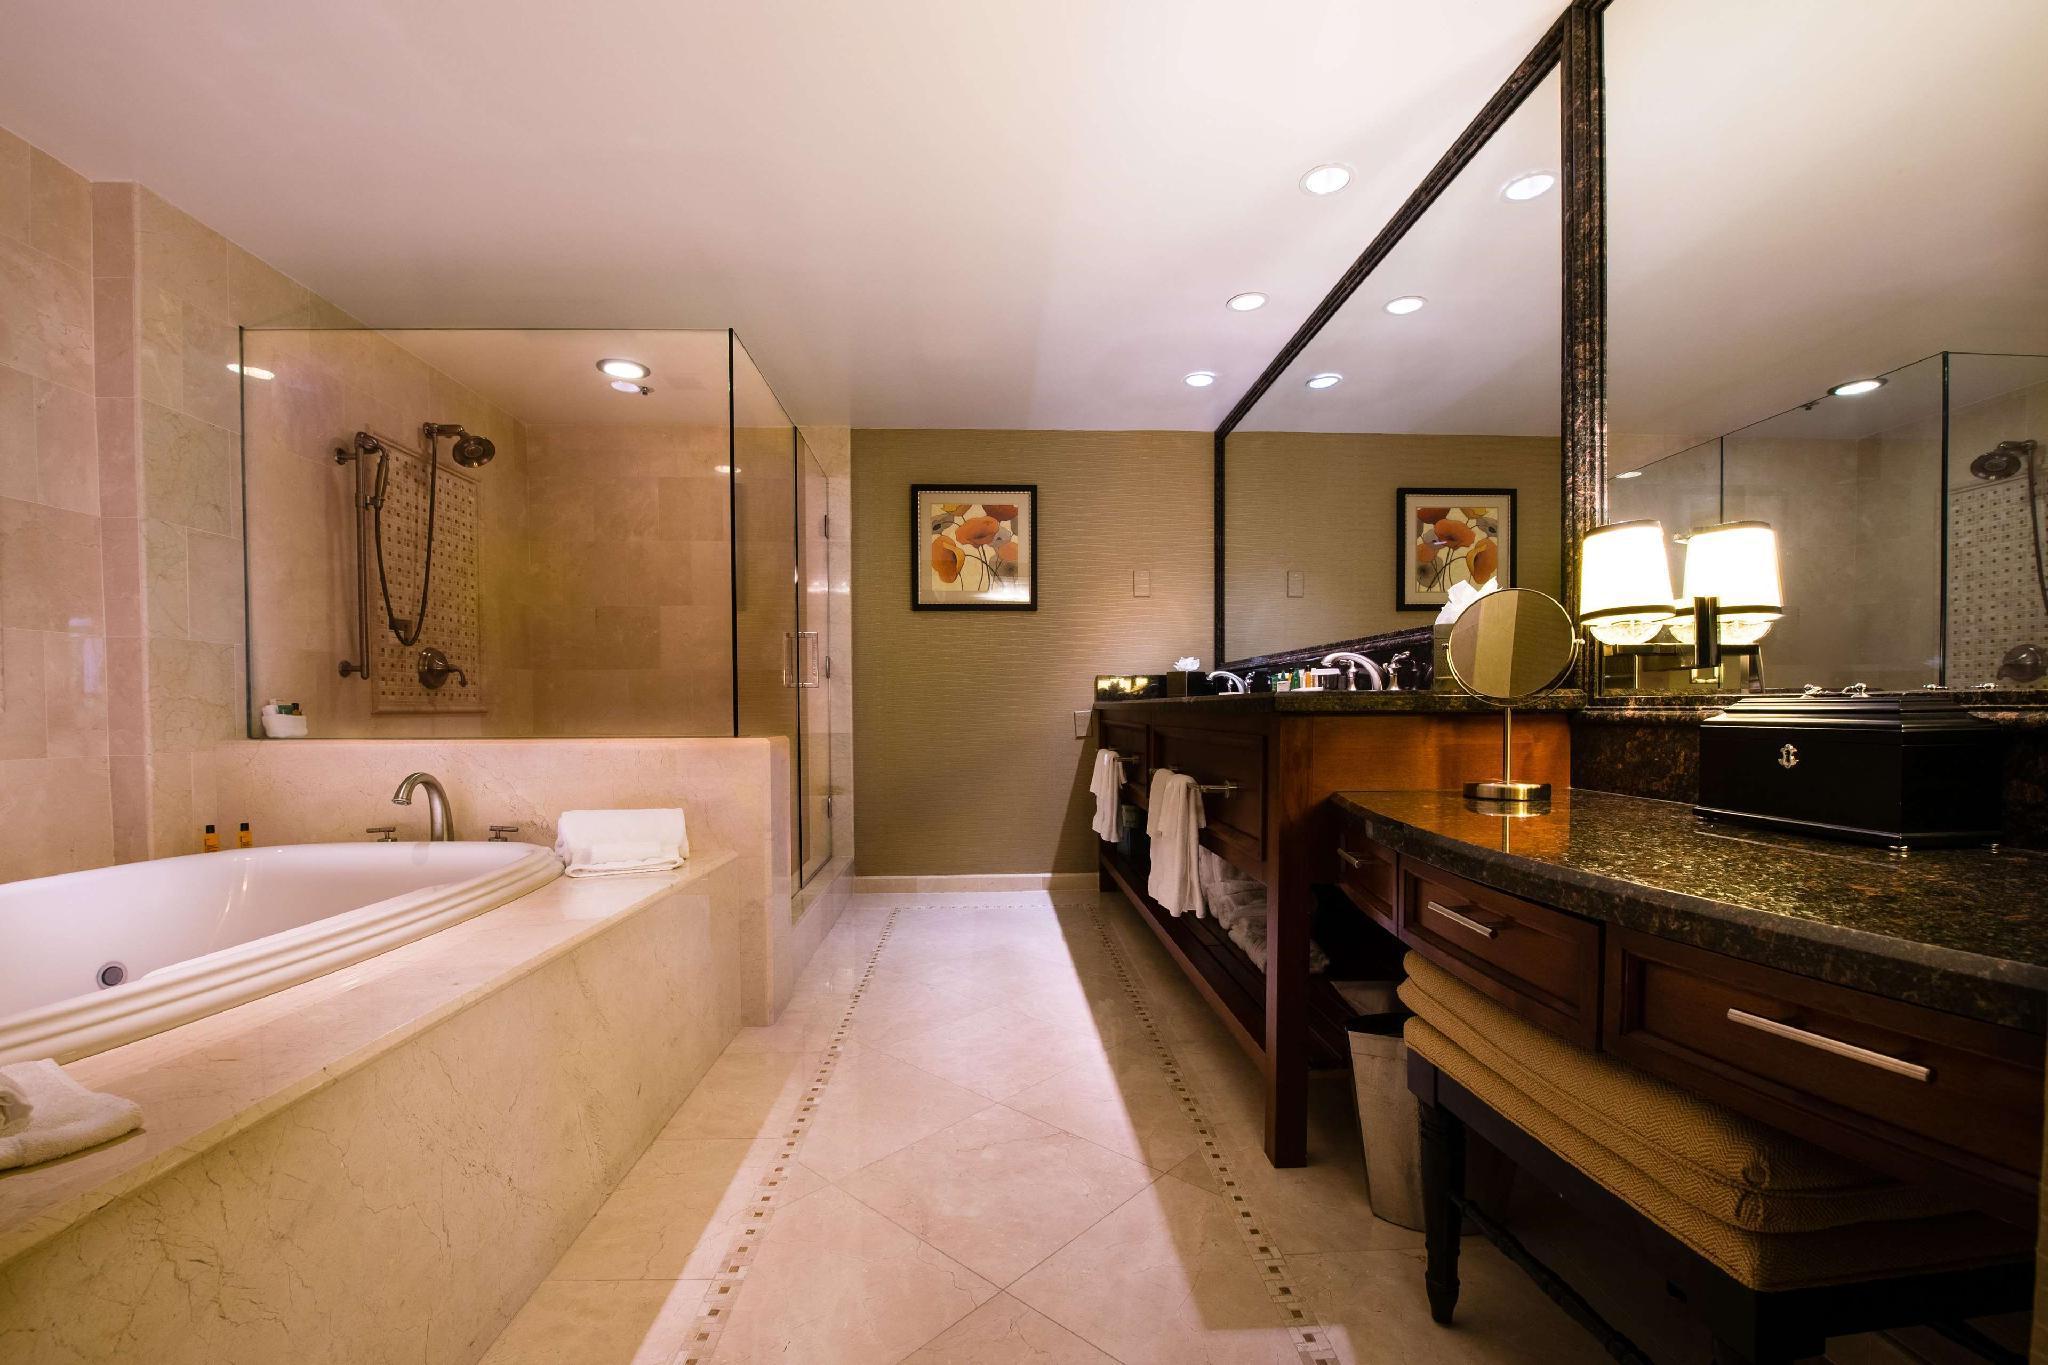 Hilton La Jolla Torrey Pines Hotel In San Diego Ca Room